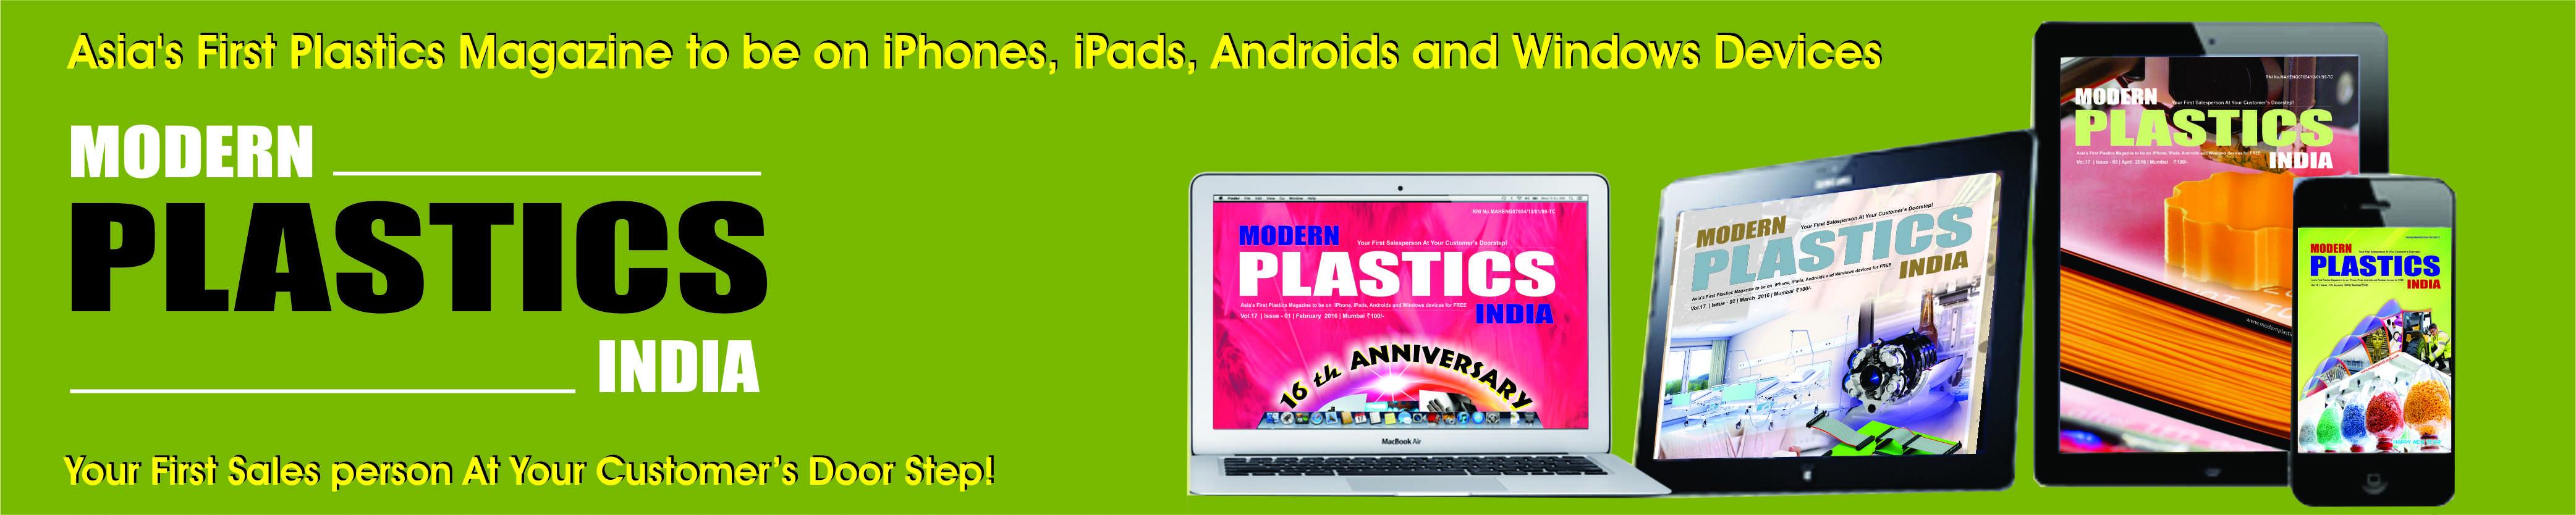 Modern Plastics India